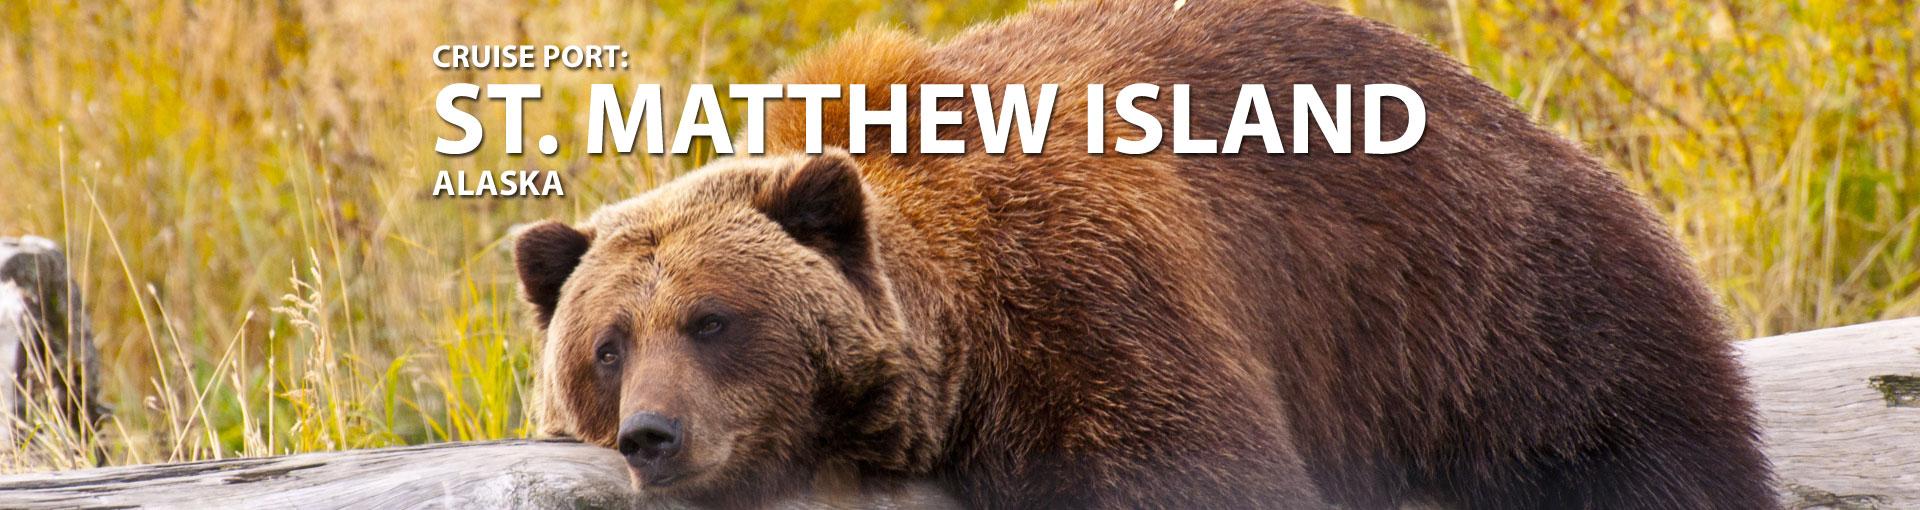 Cruises to St. Matthew Island, Alaska